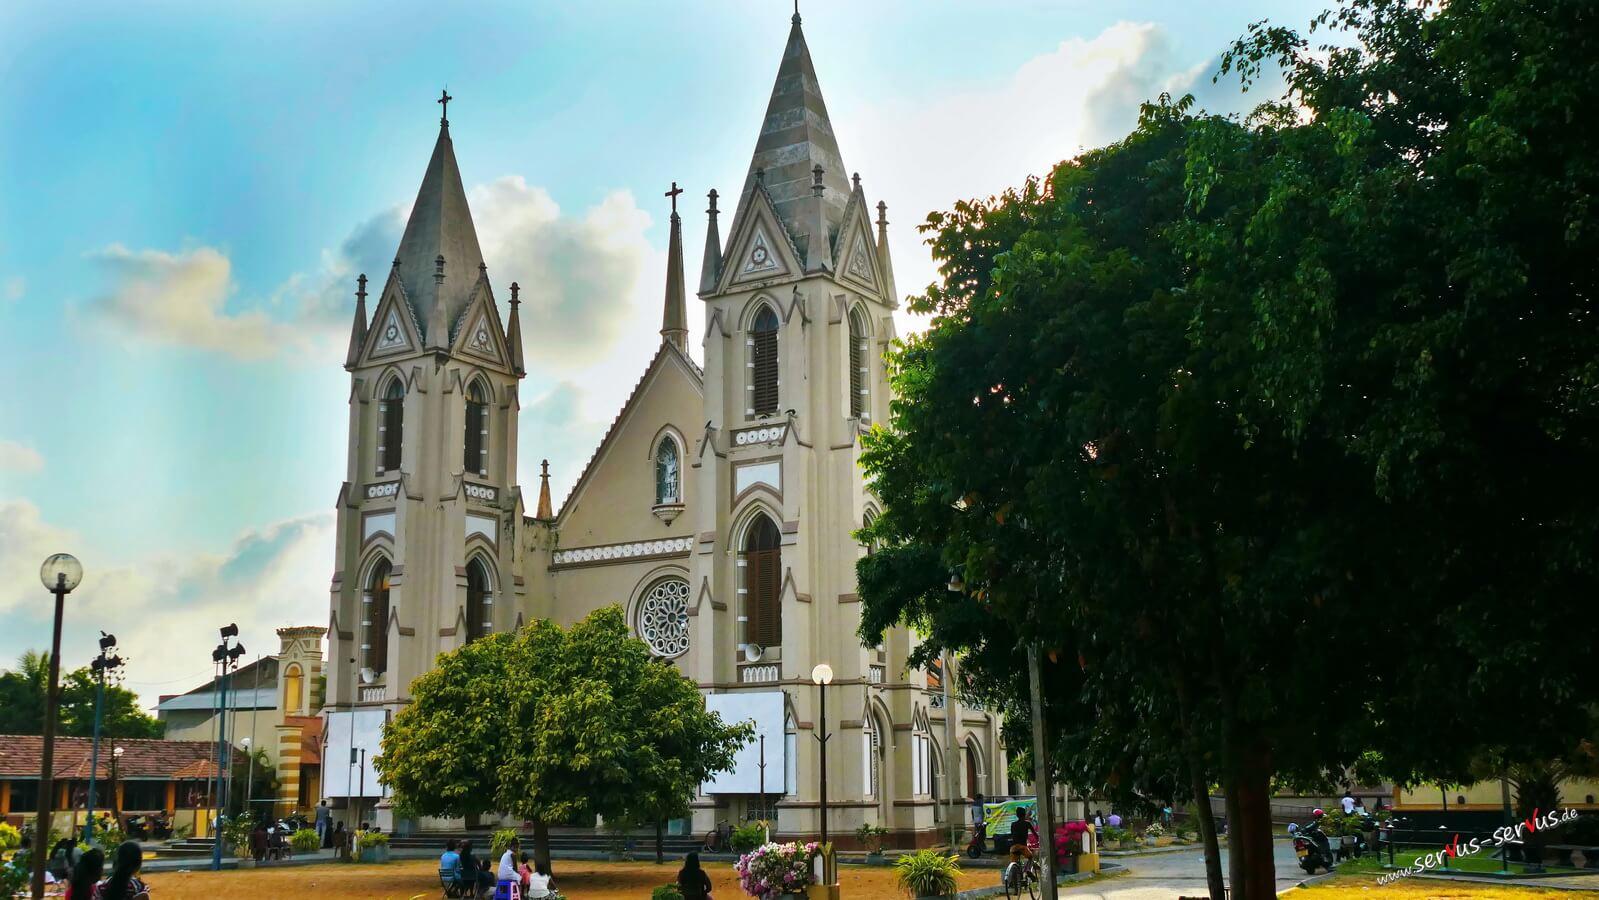 Die St. Sebastians Kirrche in Negombo, Sri Lanka